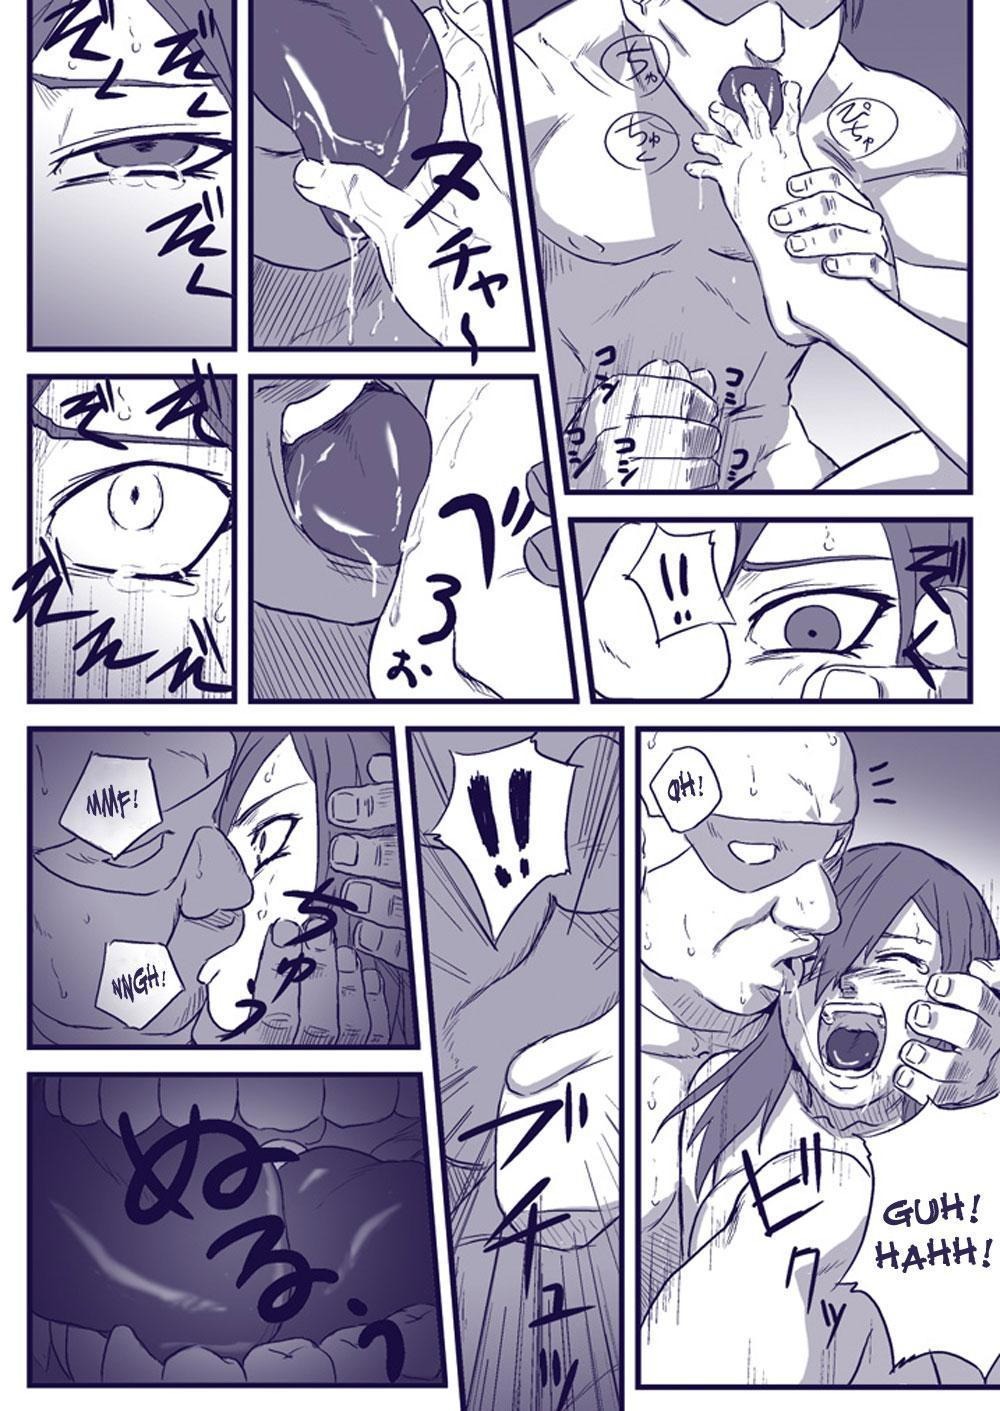 Ninja Izonshou Vol. 2 | Ninja Dependence Vol. 2 10